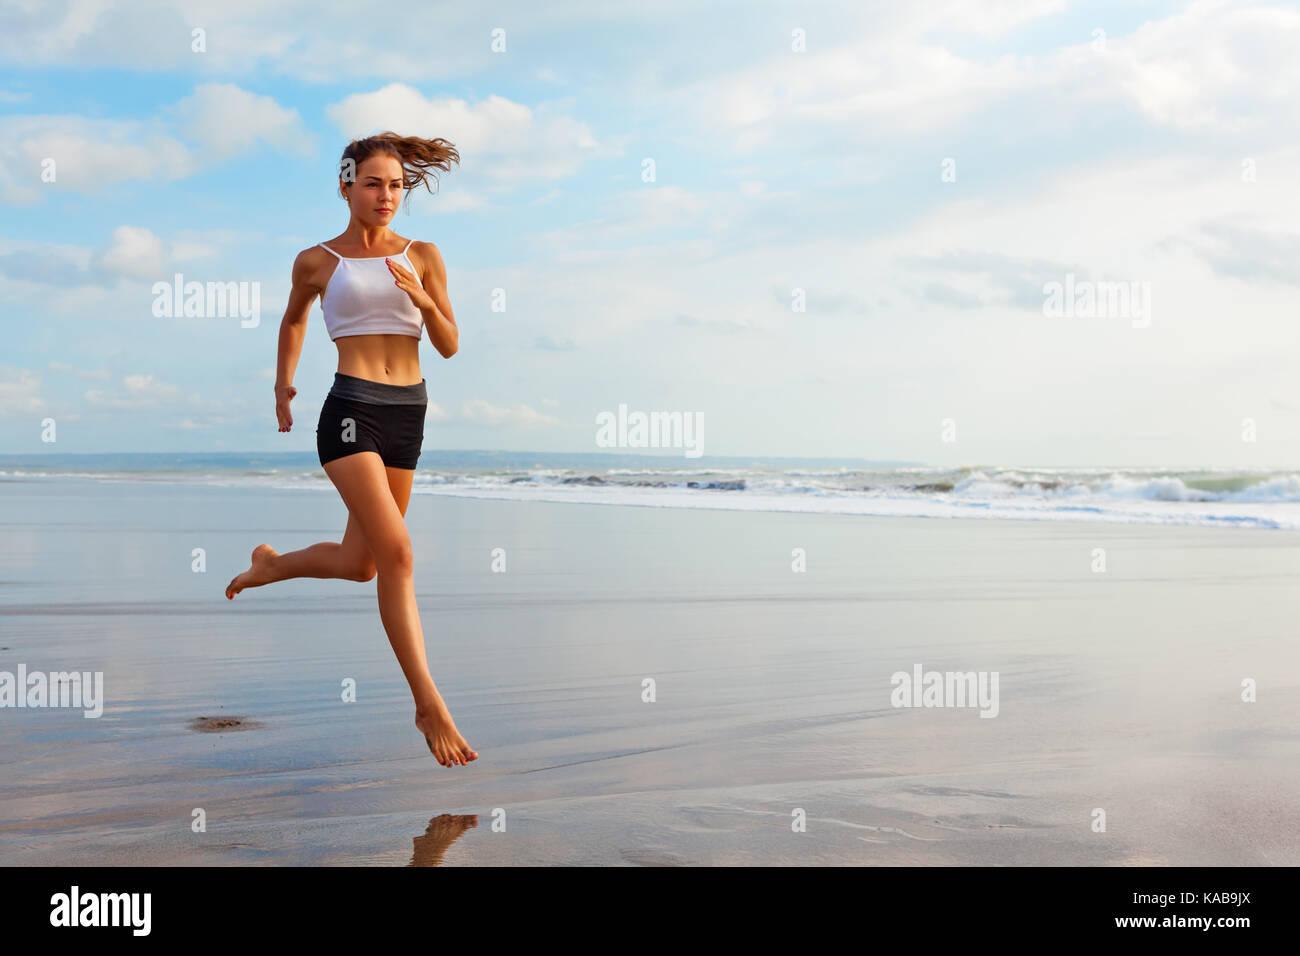 teen jogging photos teen jogging images alamy. Black Bedroom Furniture Sets. Home Design Ideas